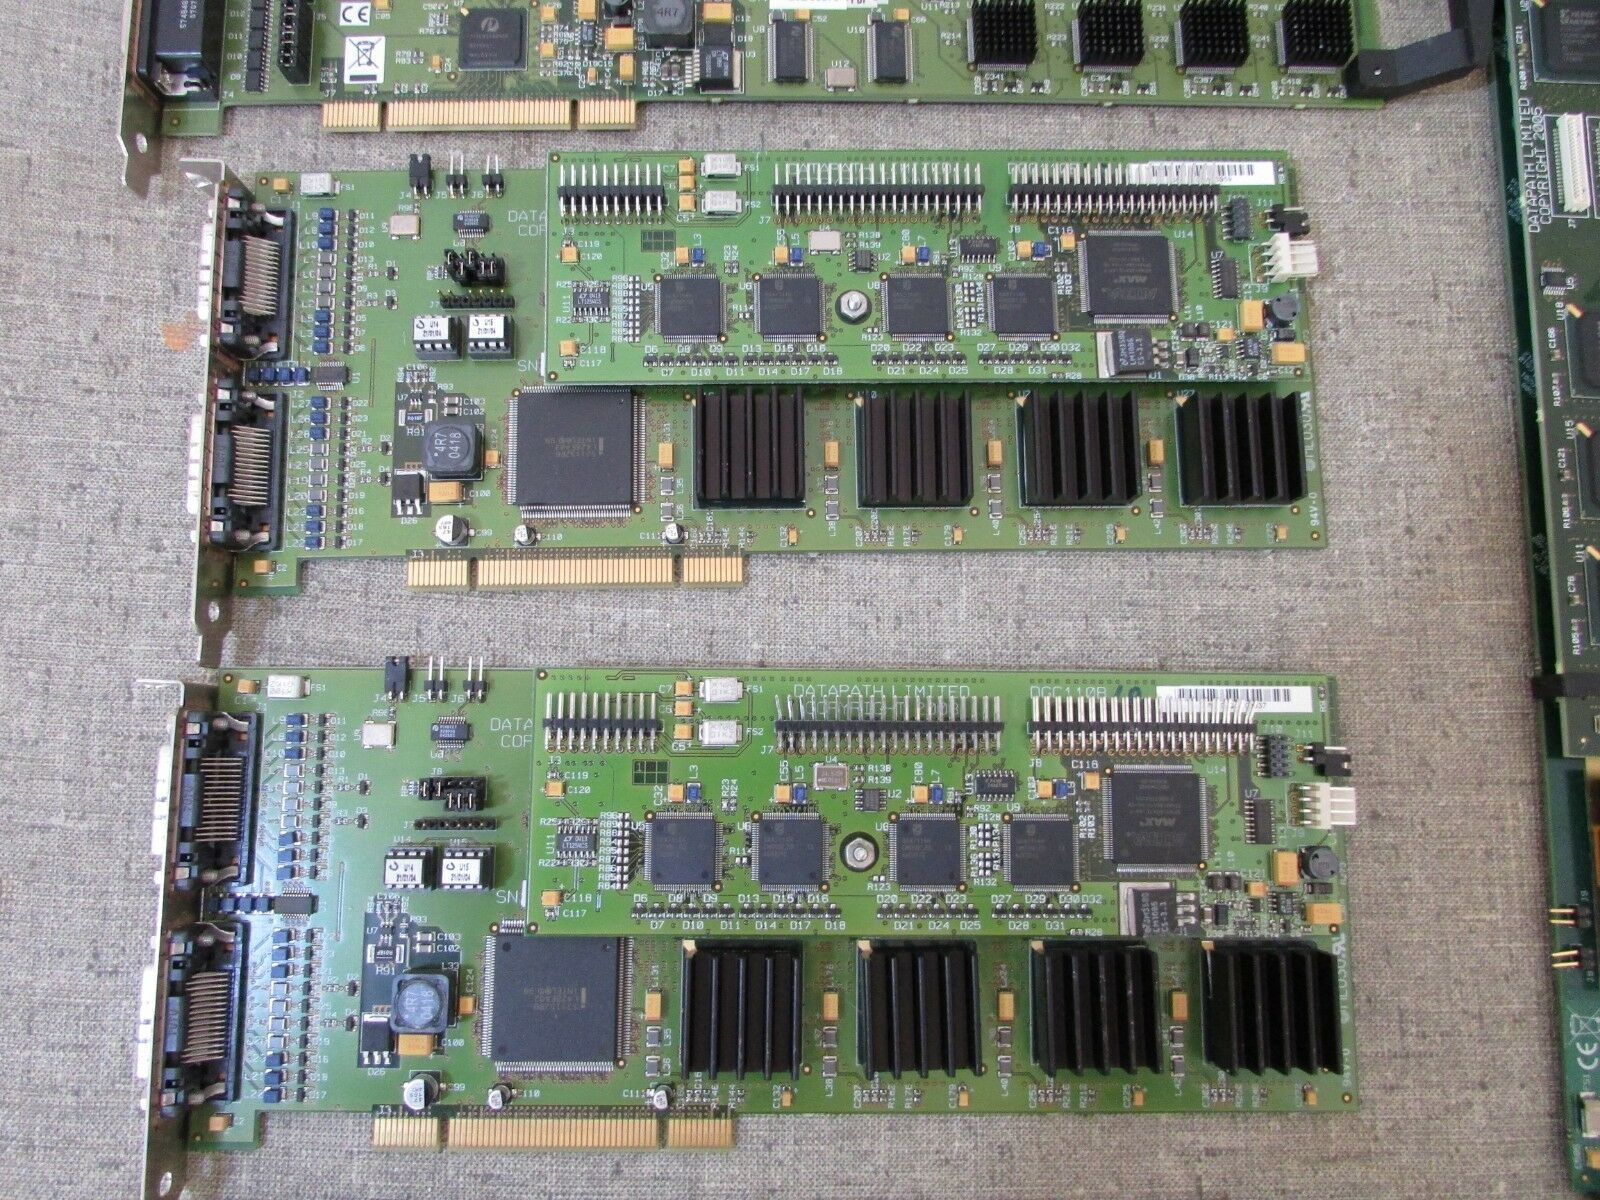 (12) Datapath Vision Video Capture Card PCIe - DGC123D DGC120E DGC110B Lot of 12